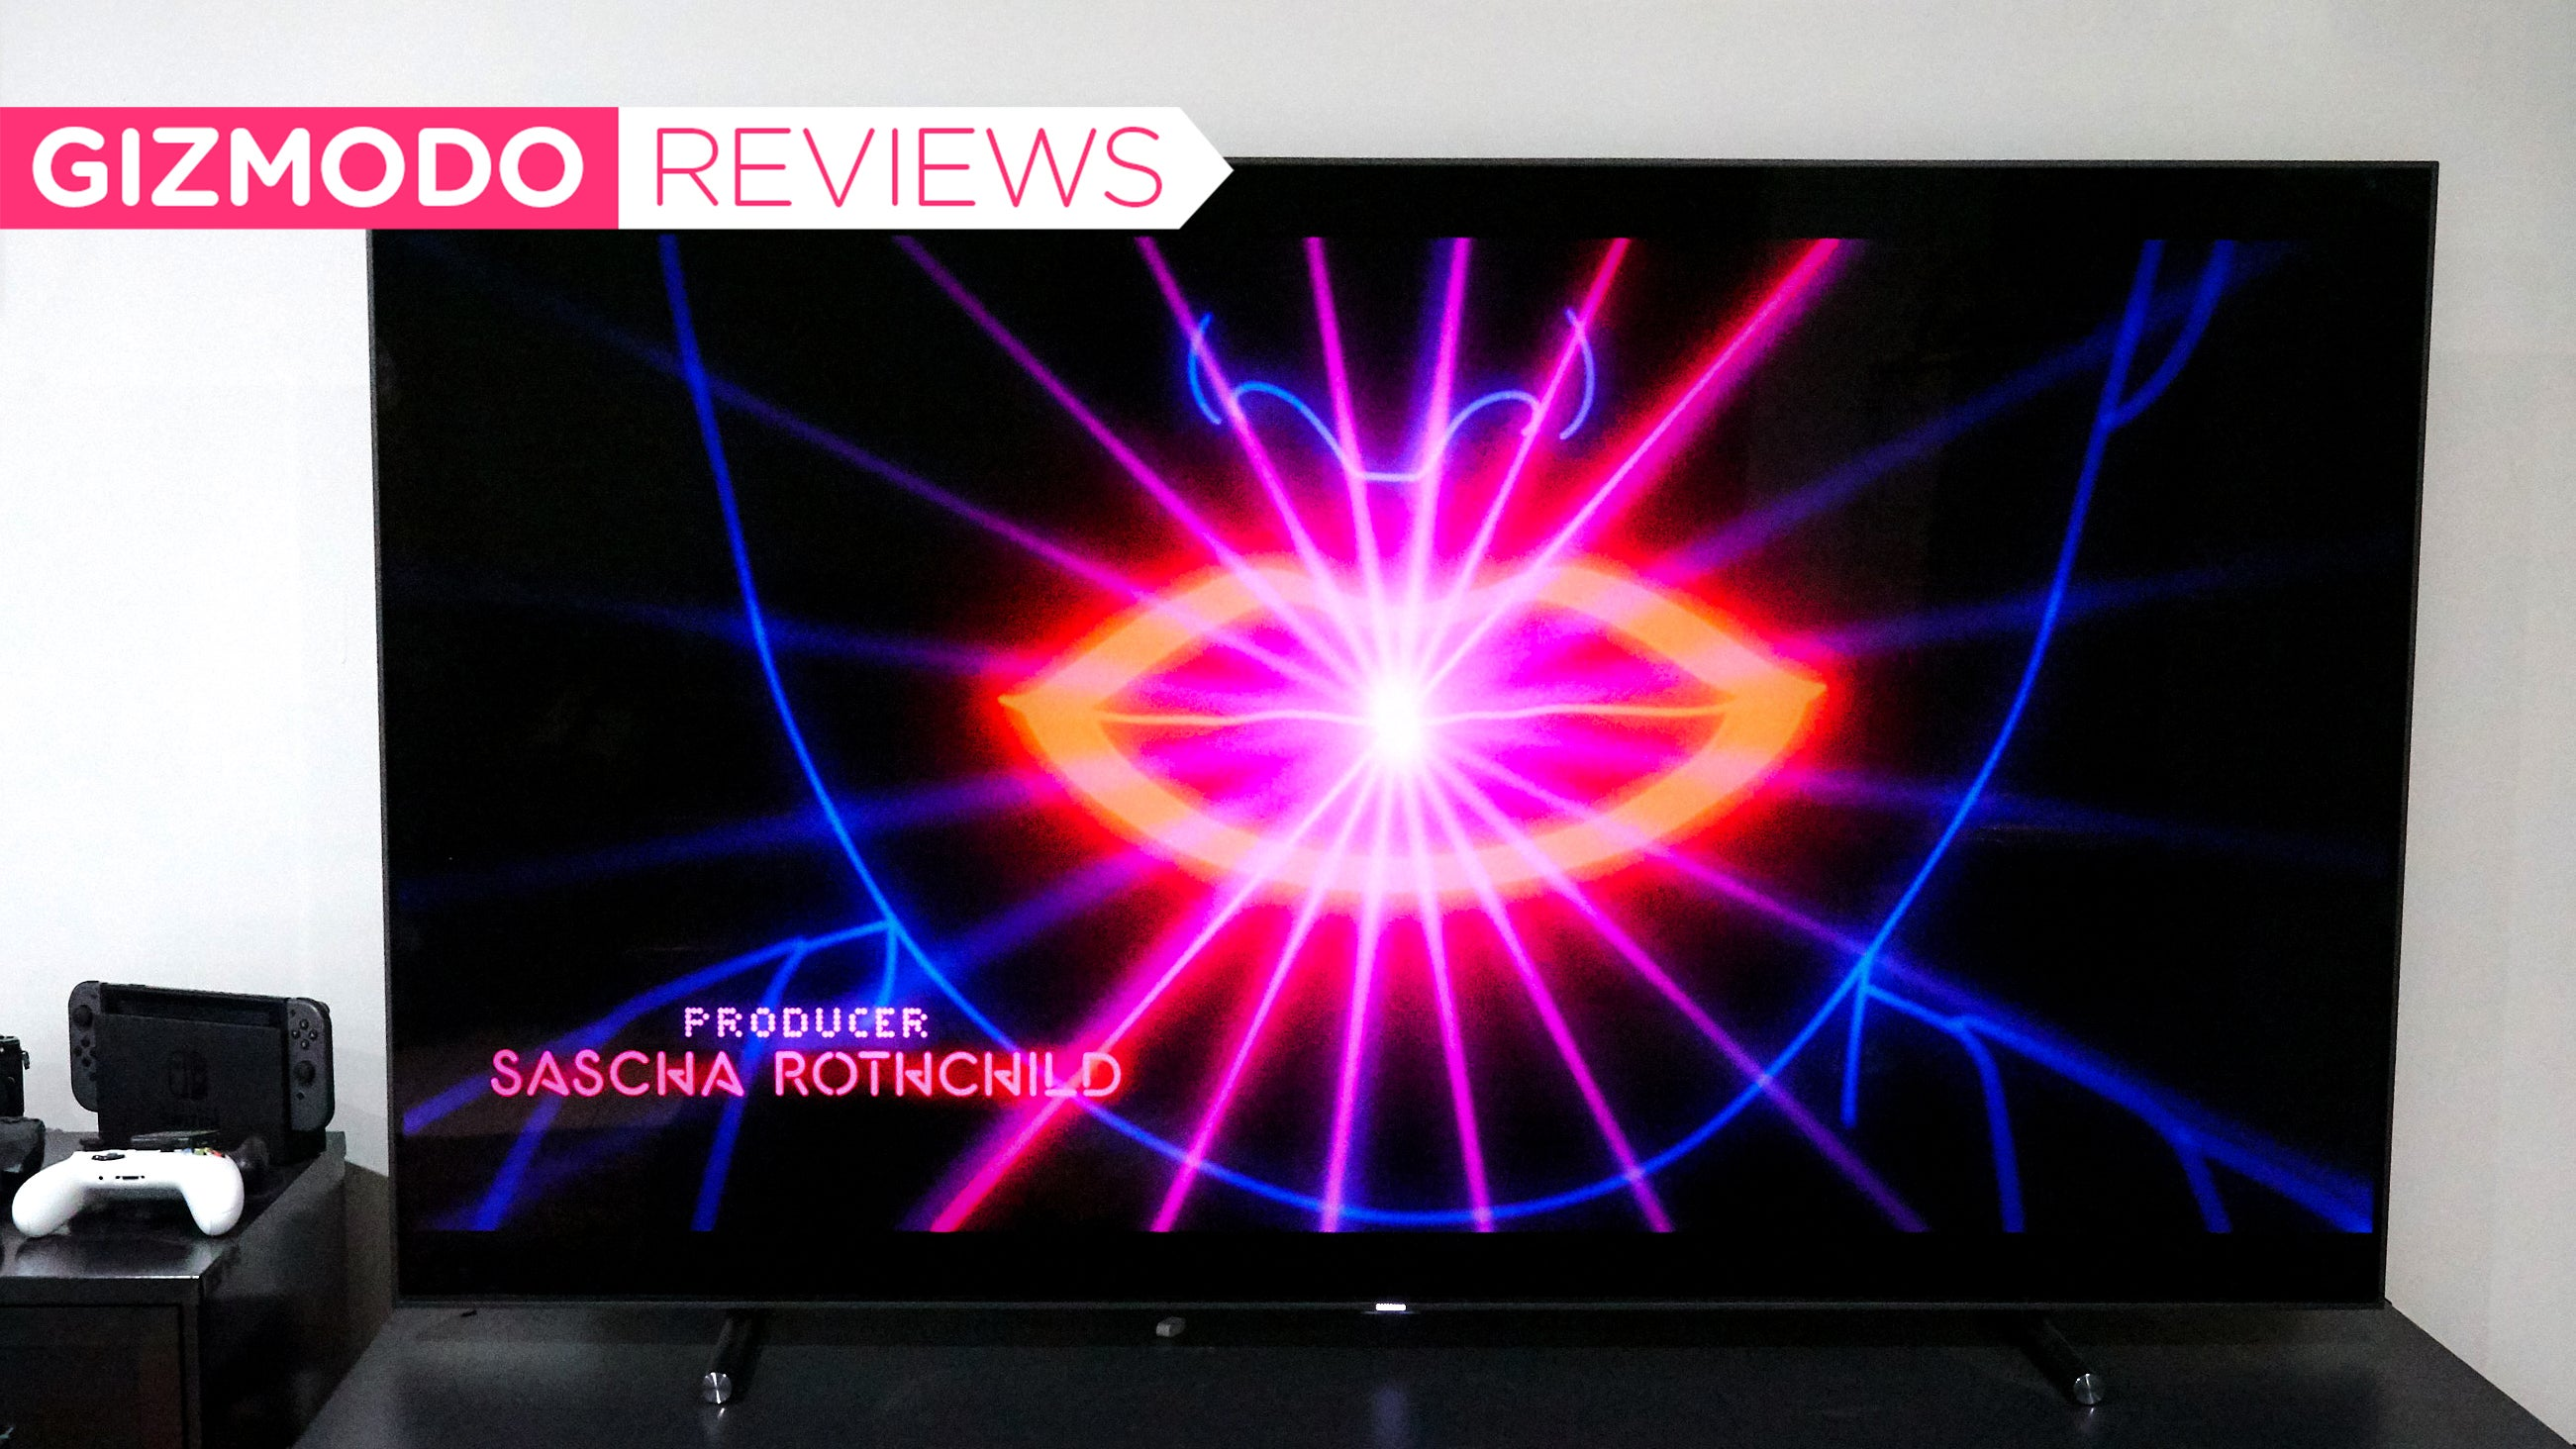 Samsung Q9 QLED TV: The Gizmodo Review